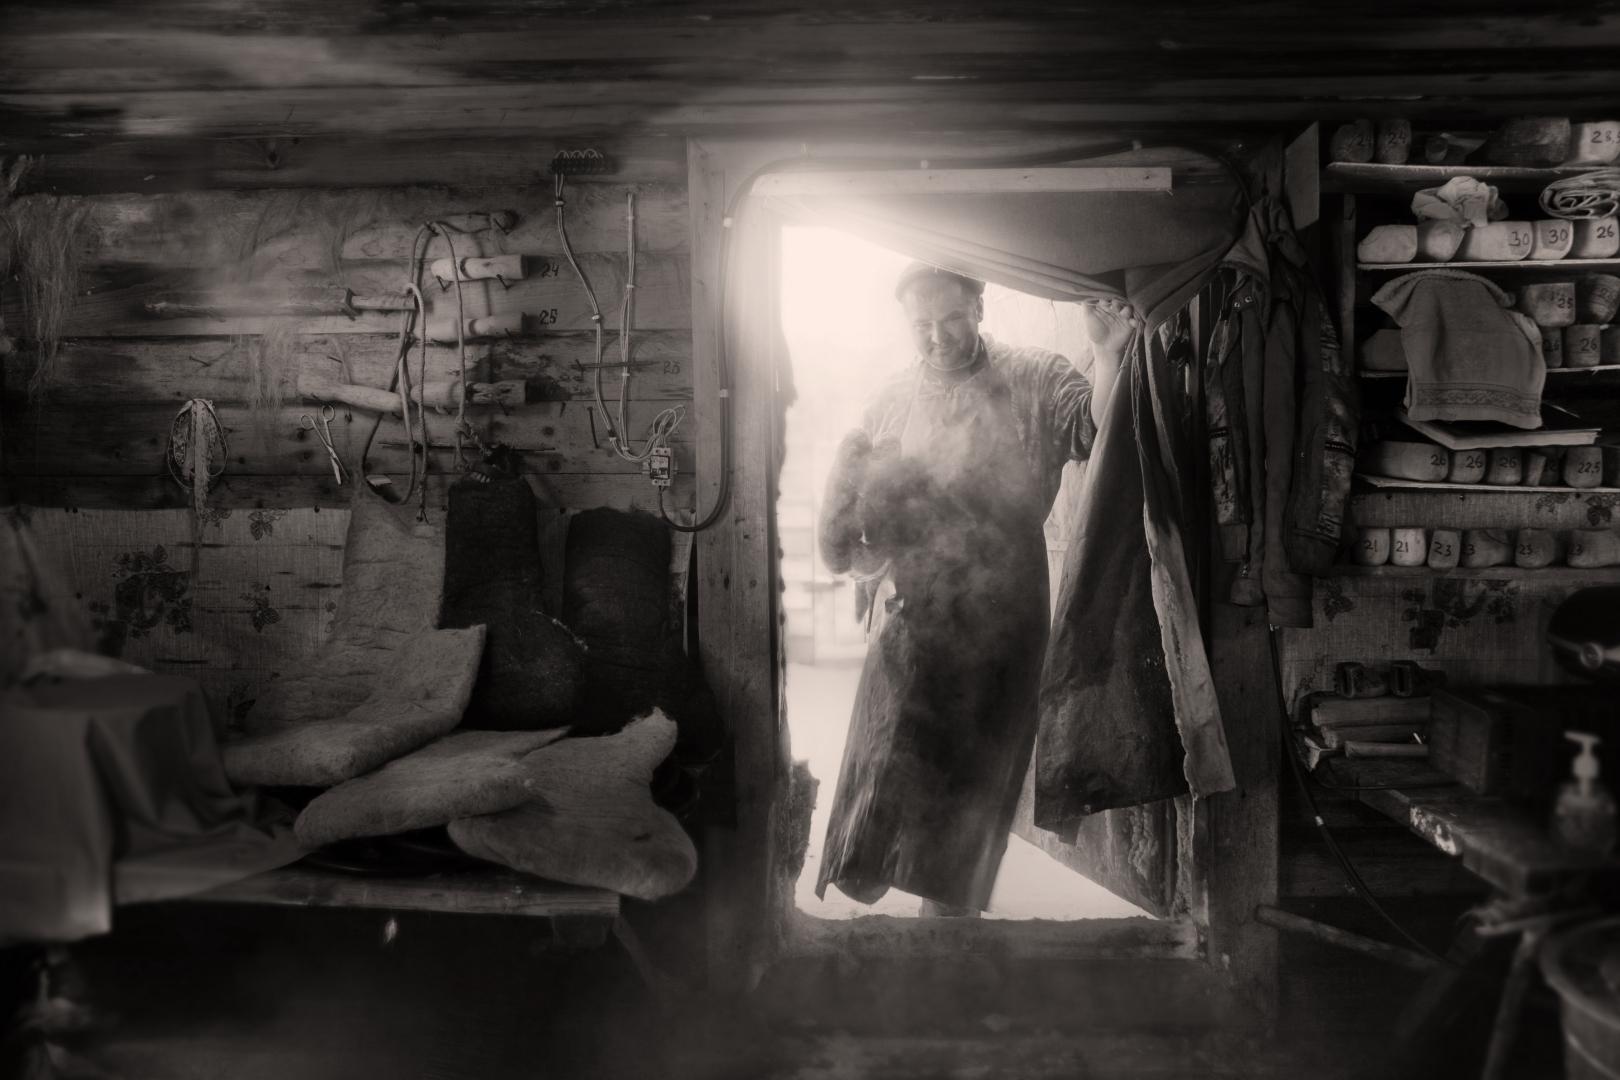 2 место в номинации «Народное творчество» — работа Олега Кугаева «Пимокат Иван»